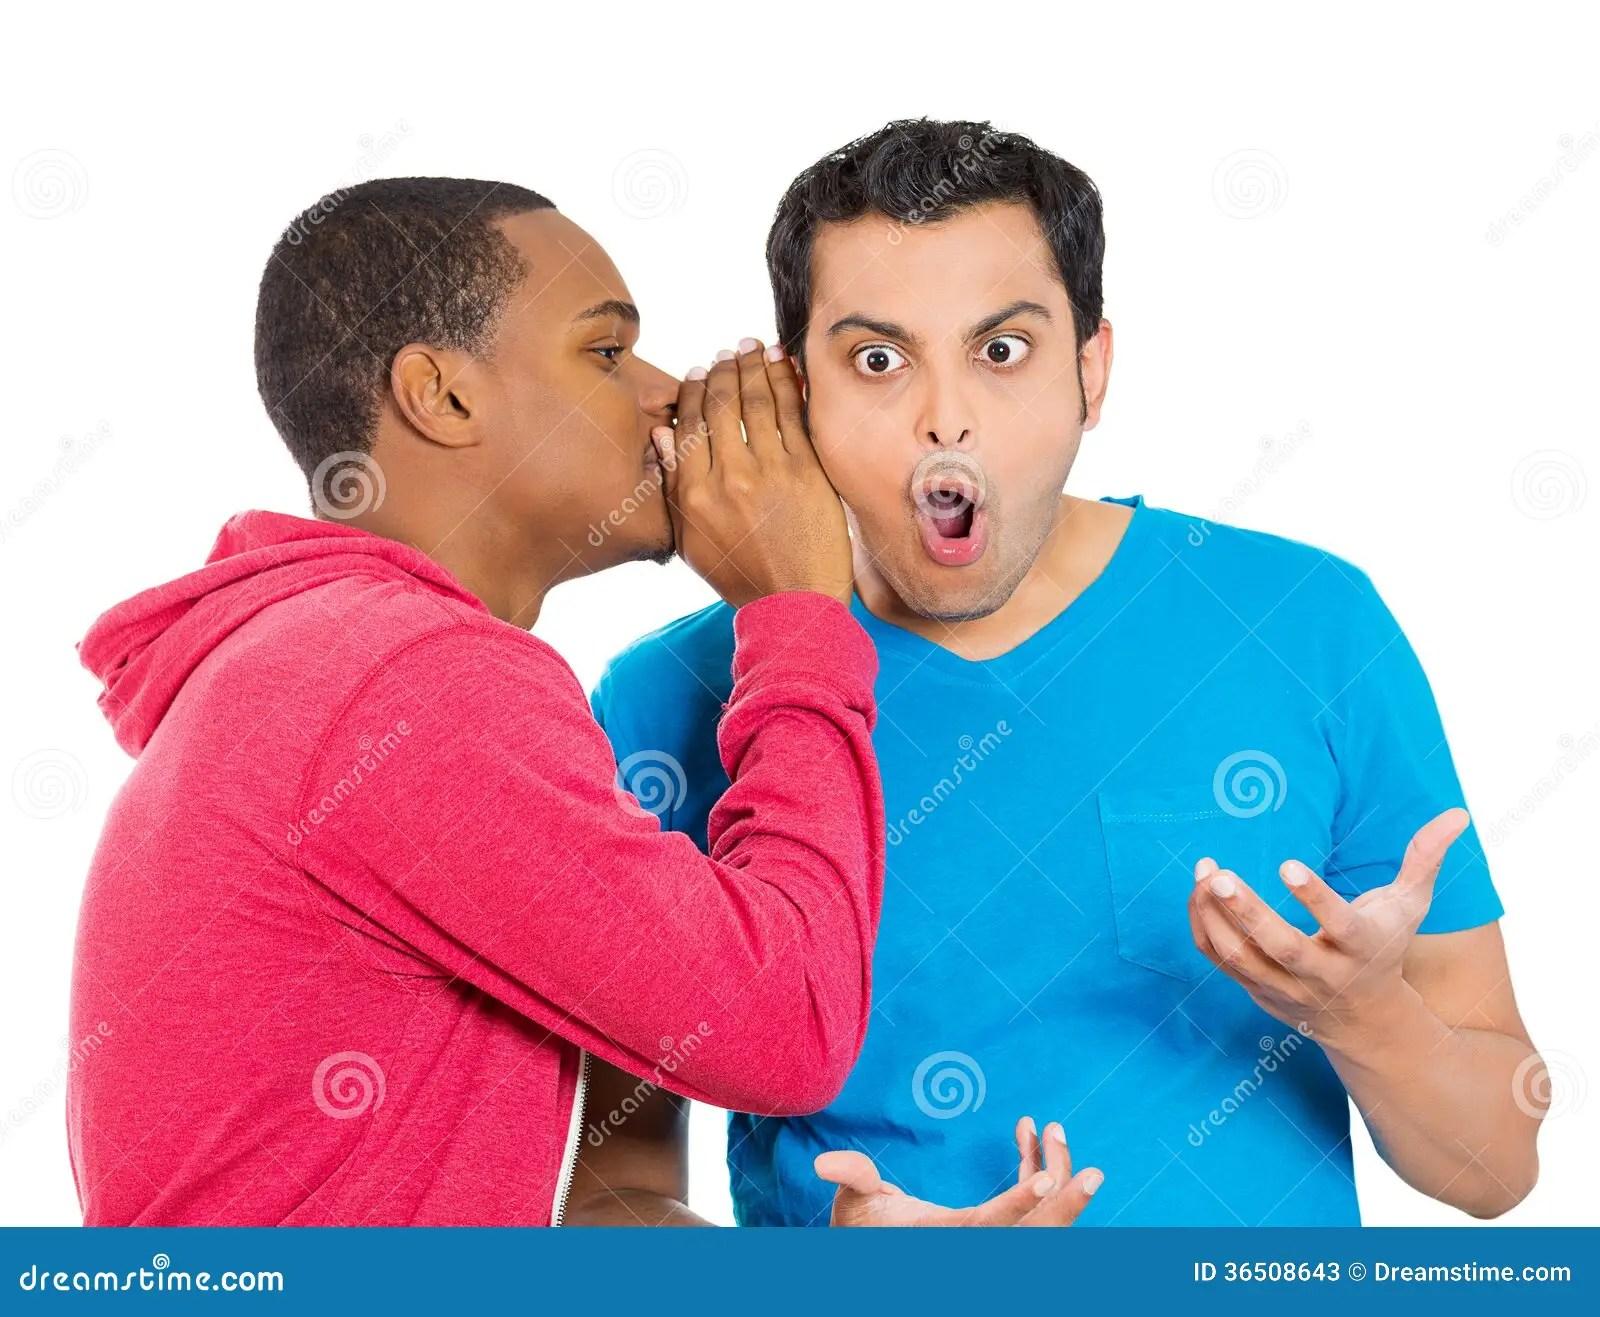 Office Gossip Rumors Surprised Guy Stock Photos Image